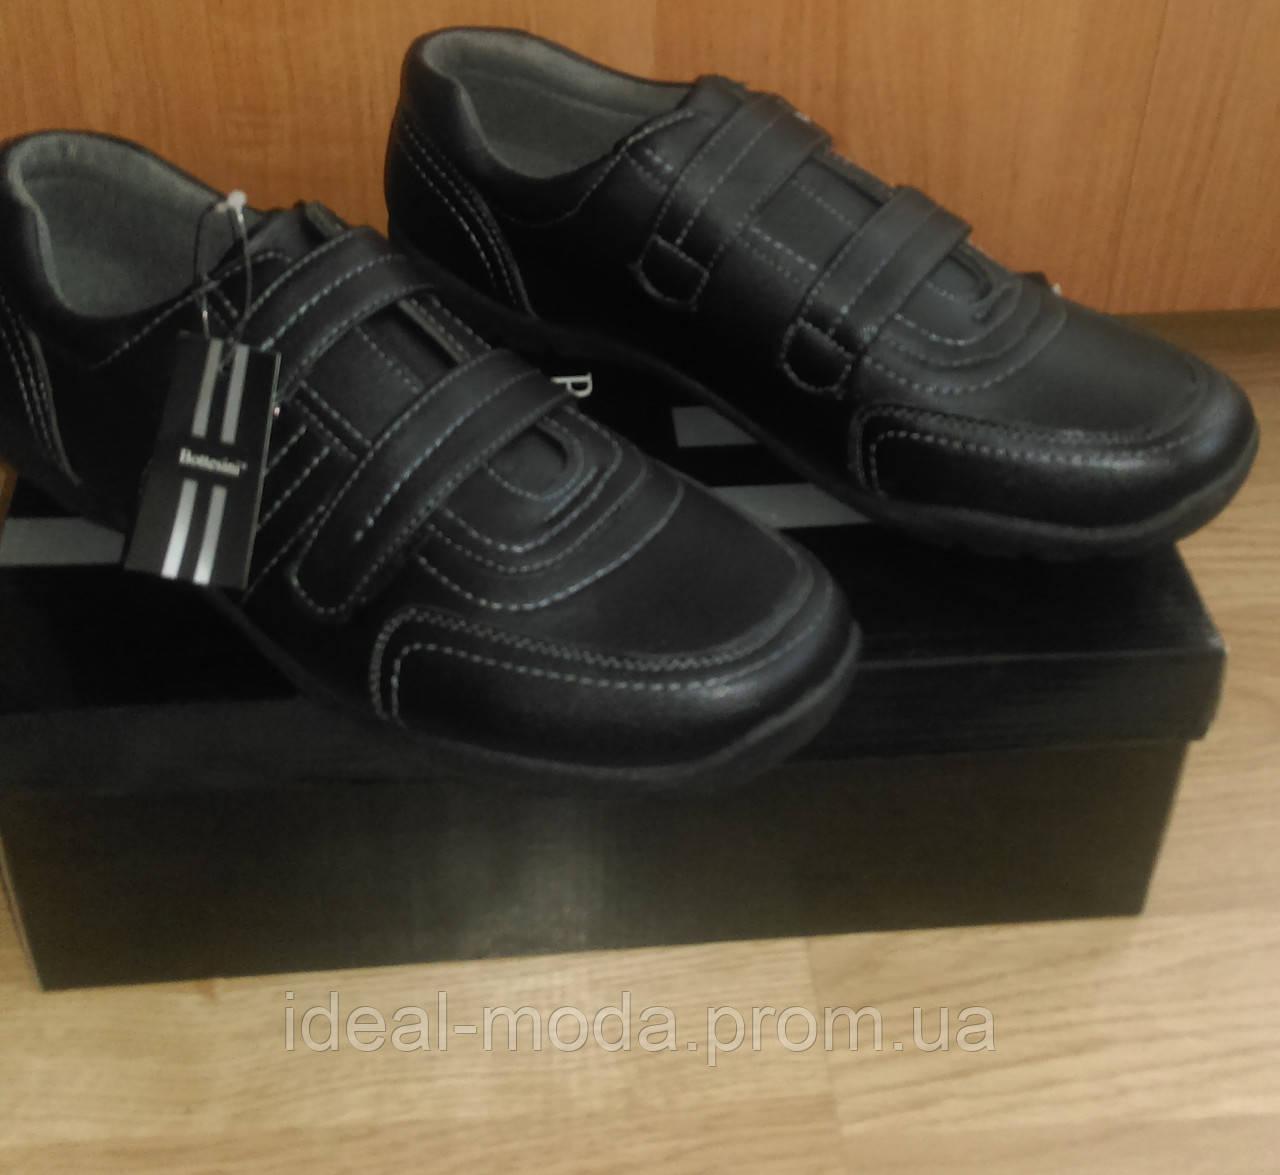 d68d2d29a Мужская обувь. Туфли кроссовки мужские Дима, фото 1 -48% Скидка Осталось 32  дня · Мужская обувь.